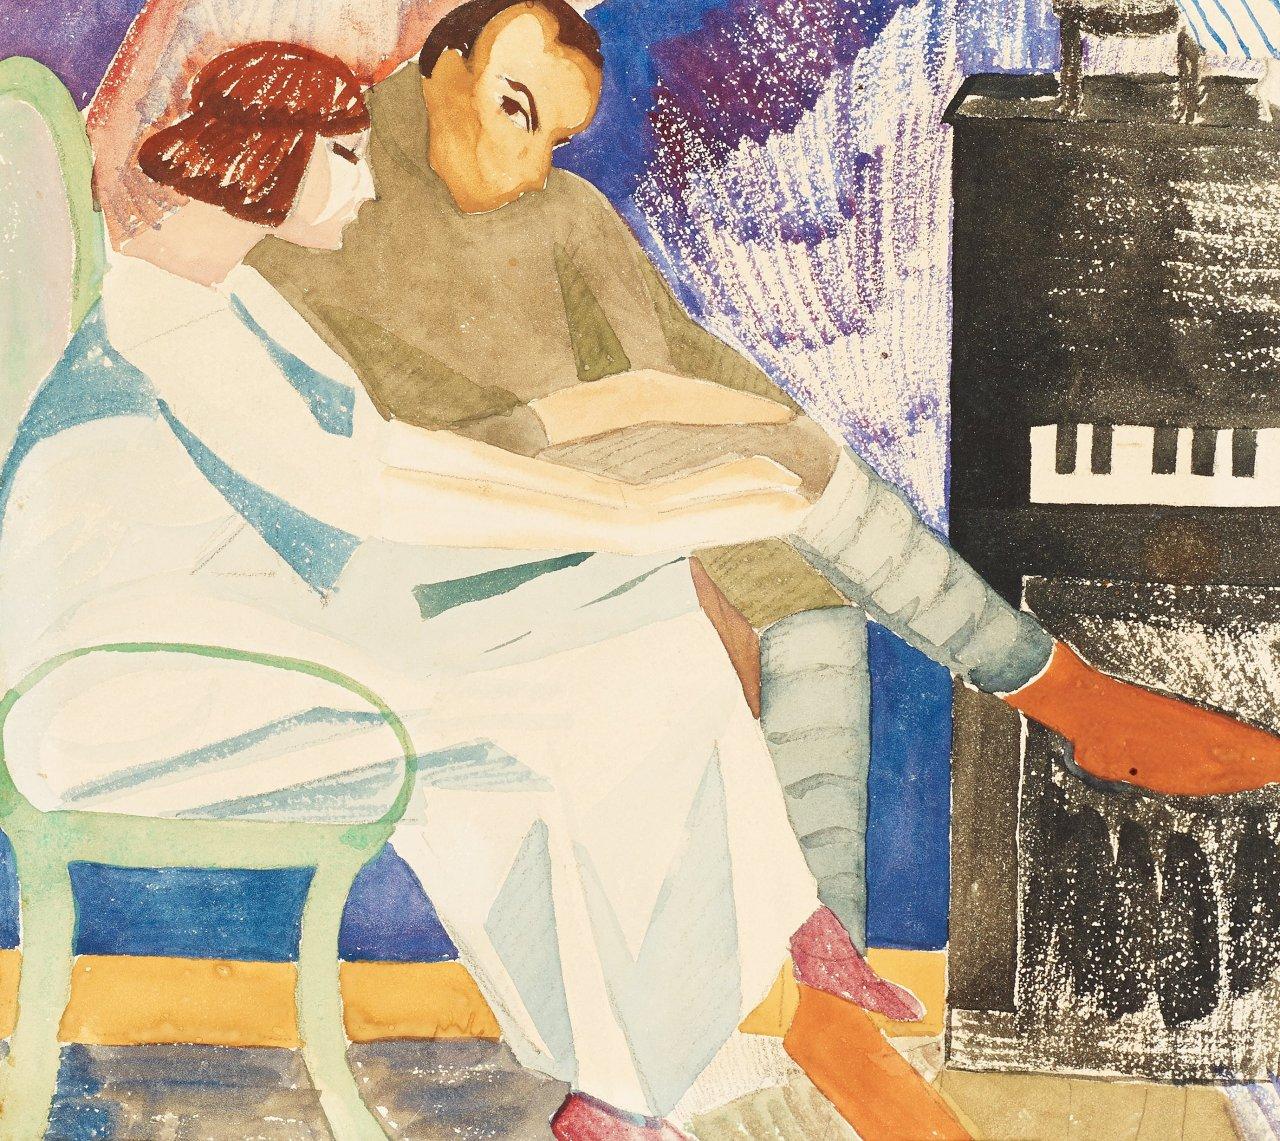 lawrenceleemagnuson:Brita Nordencreutz (Sweden 1899-1982)At the Piano (1950)watercolour 18.5 x 20cm